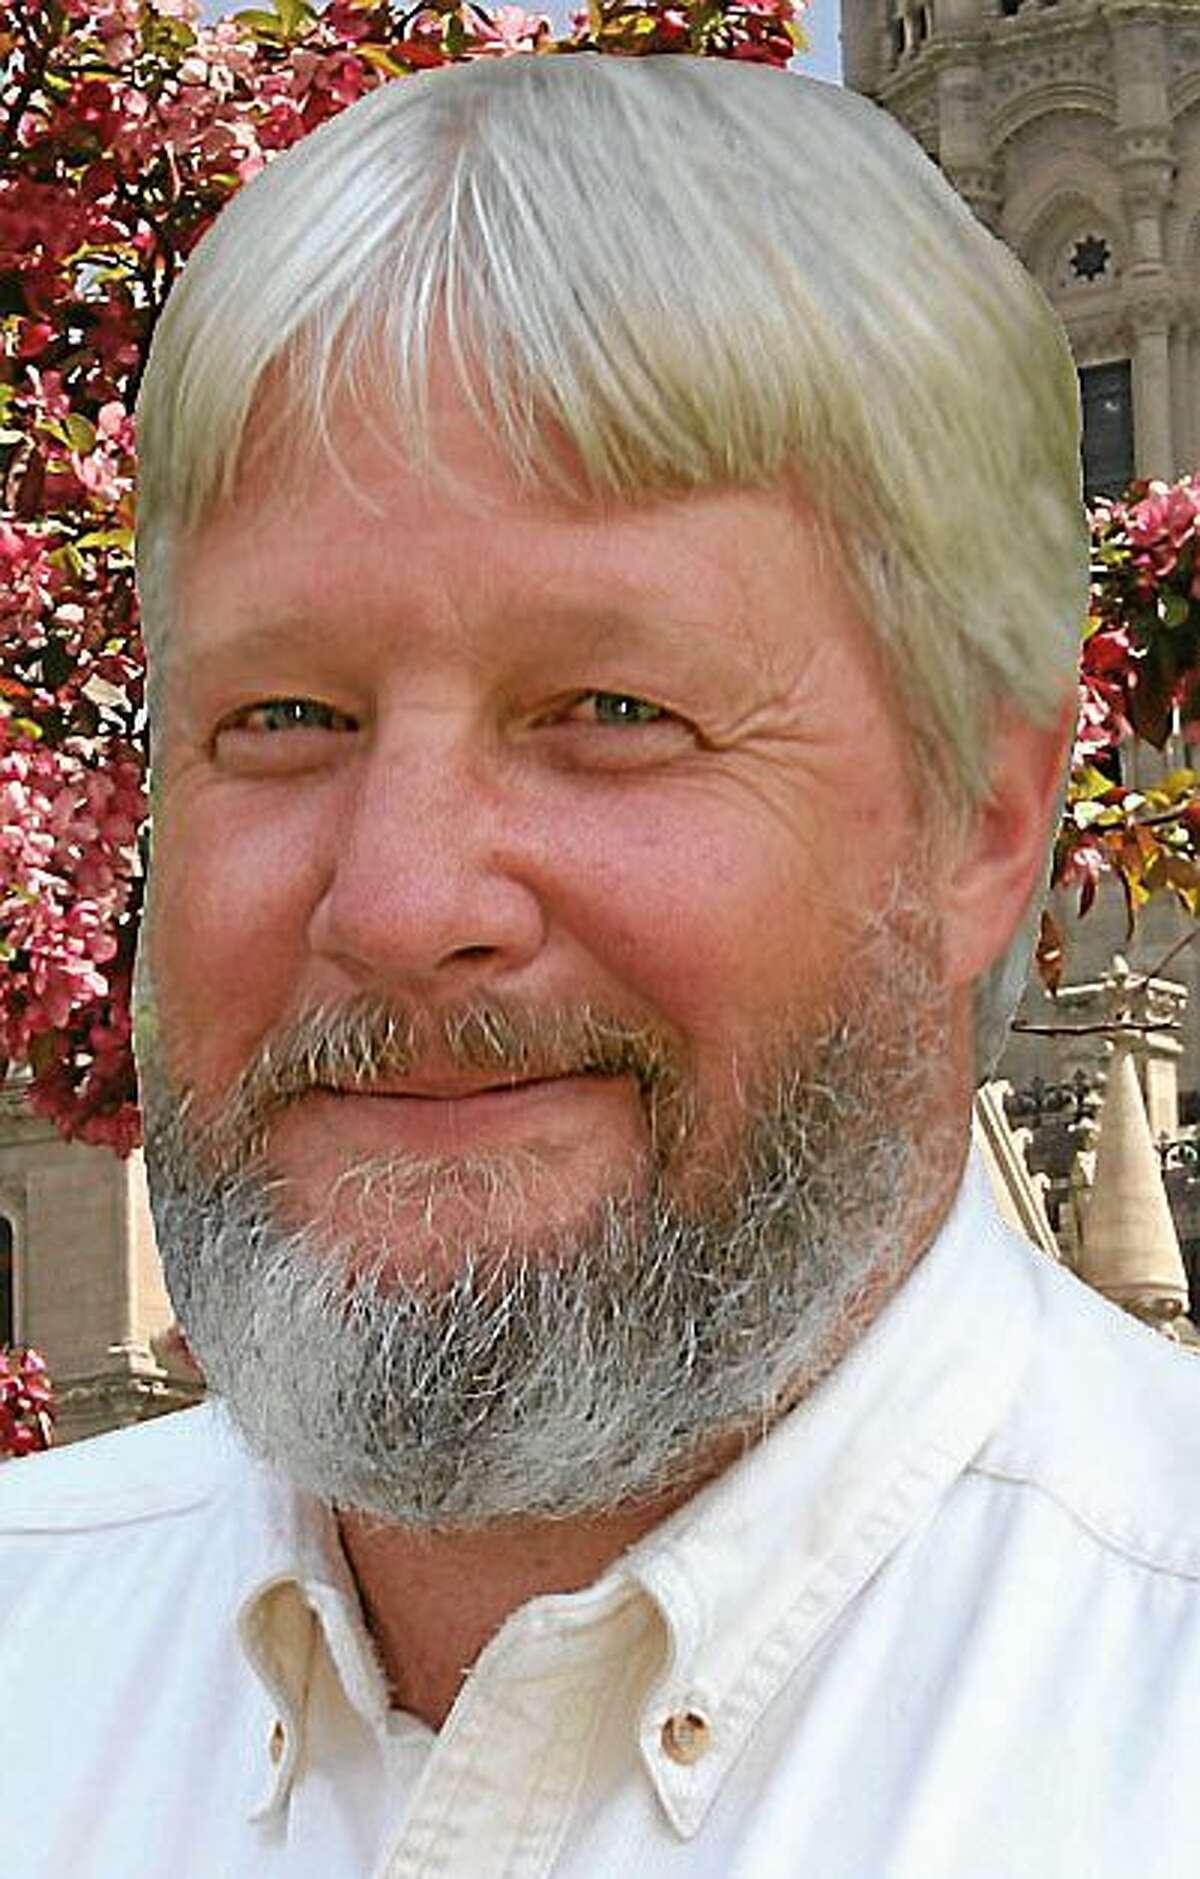 Craig Miner